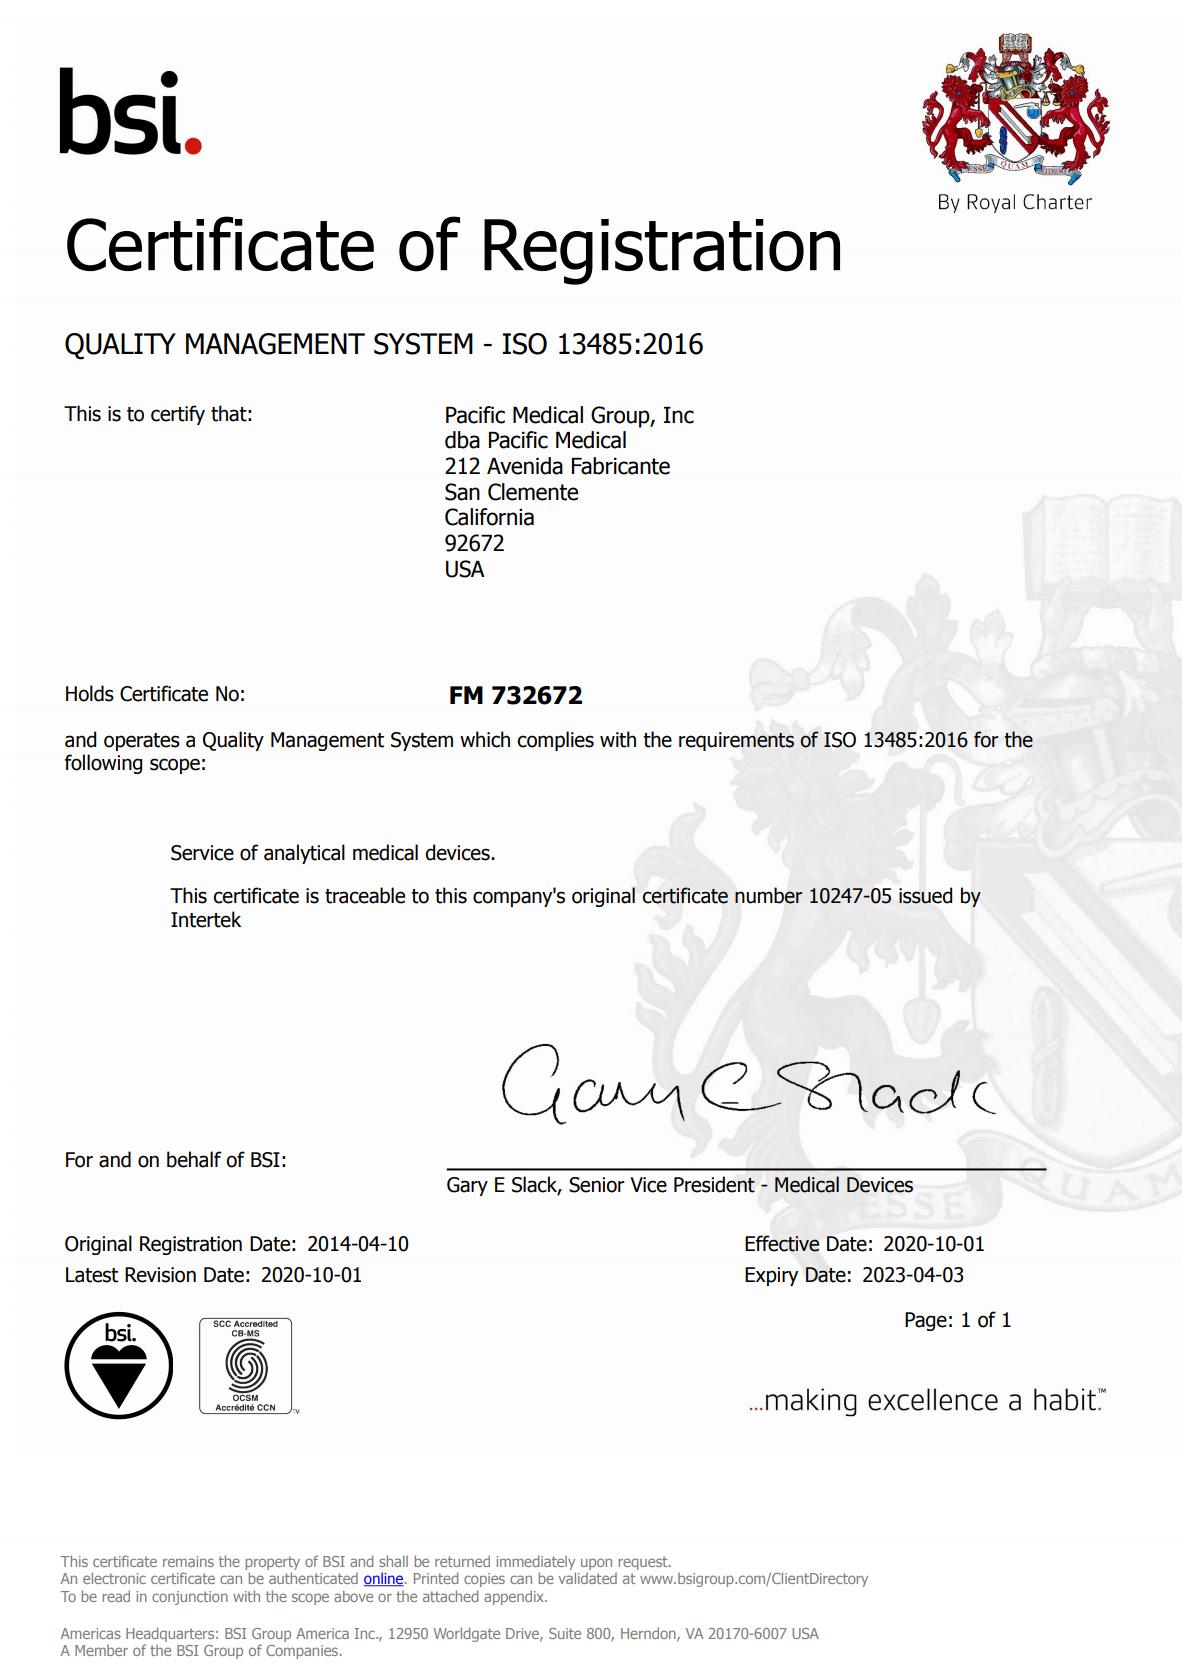 bsi-iso-13485-2016-certificate.jpg